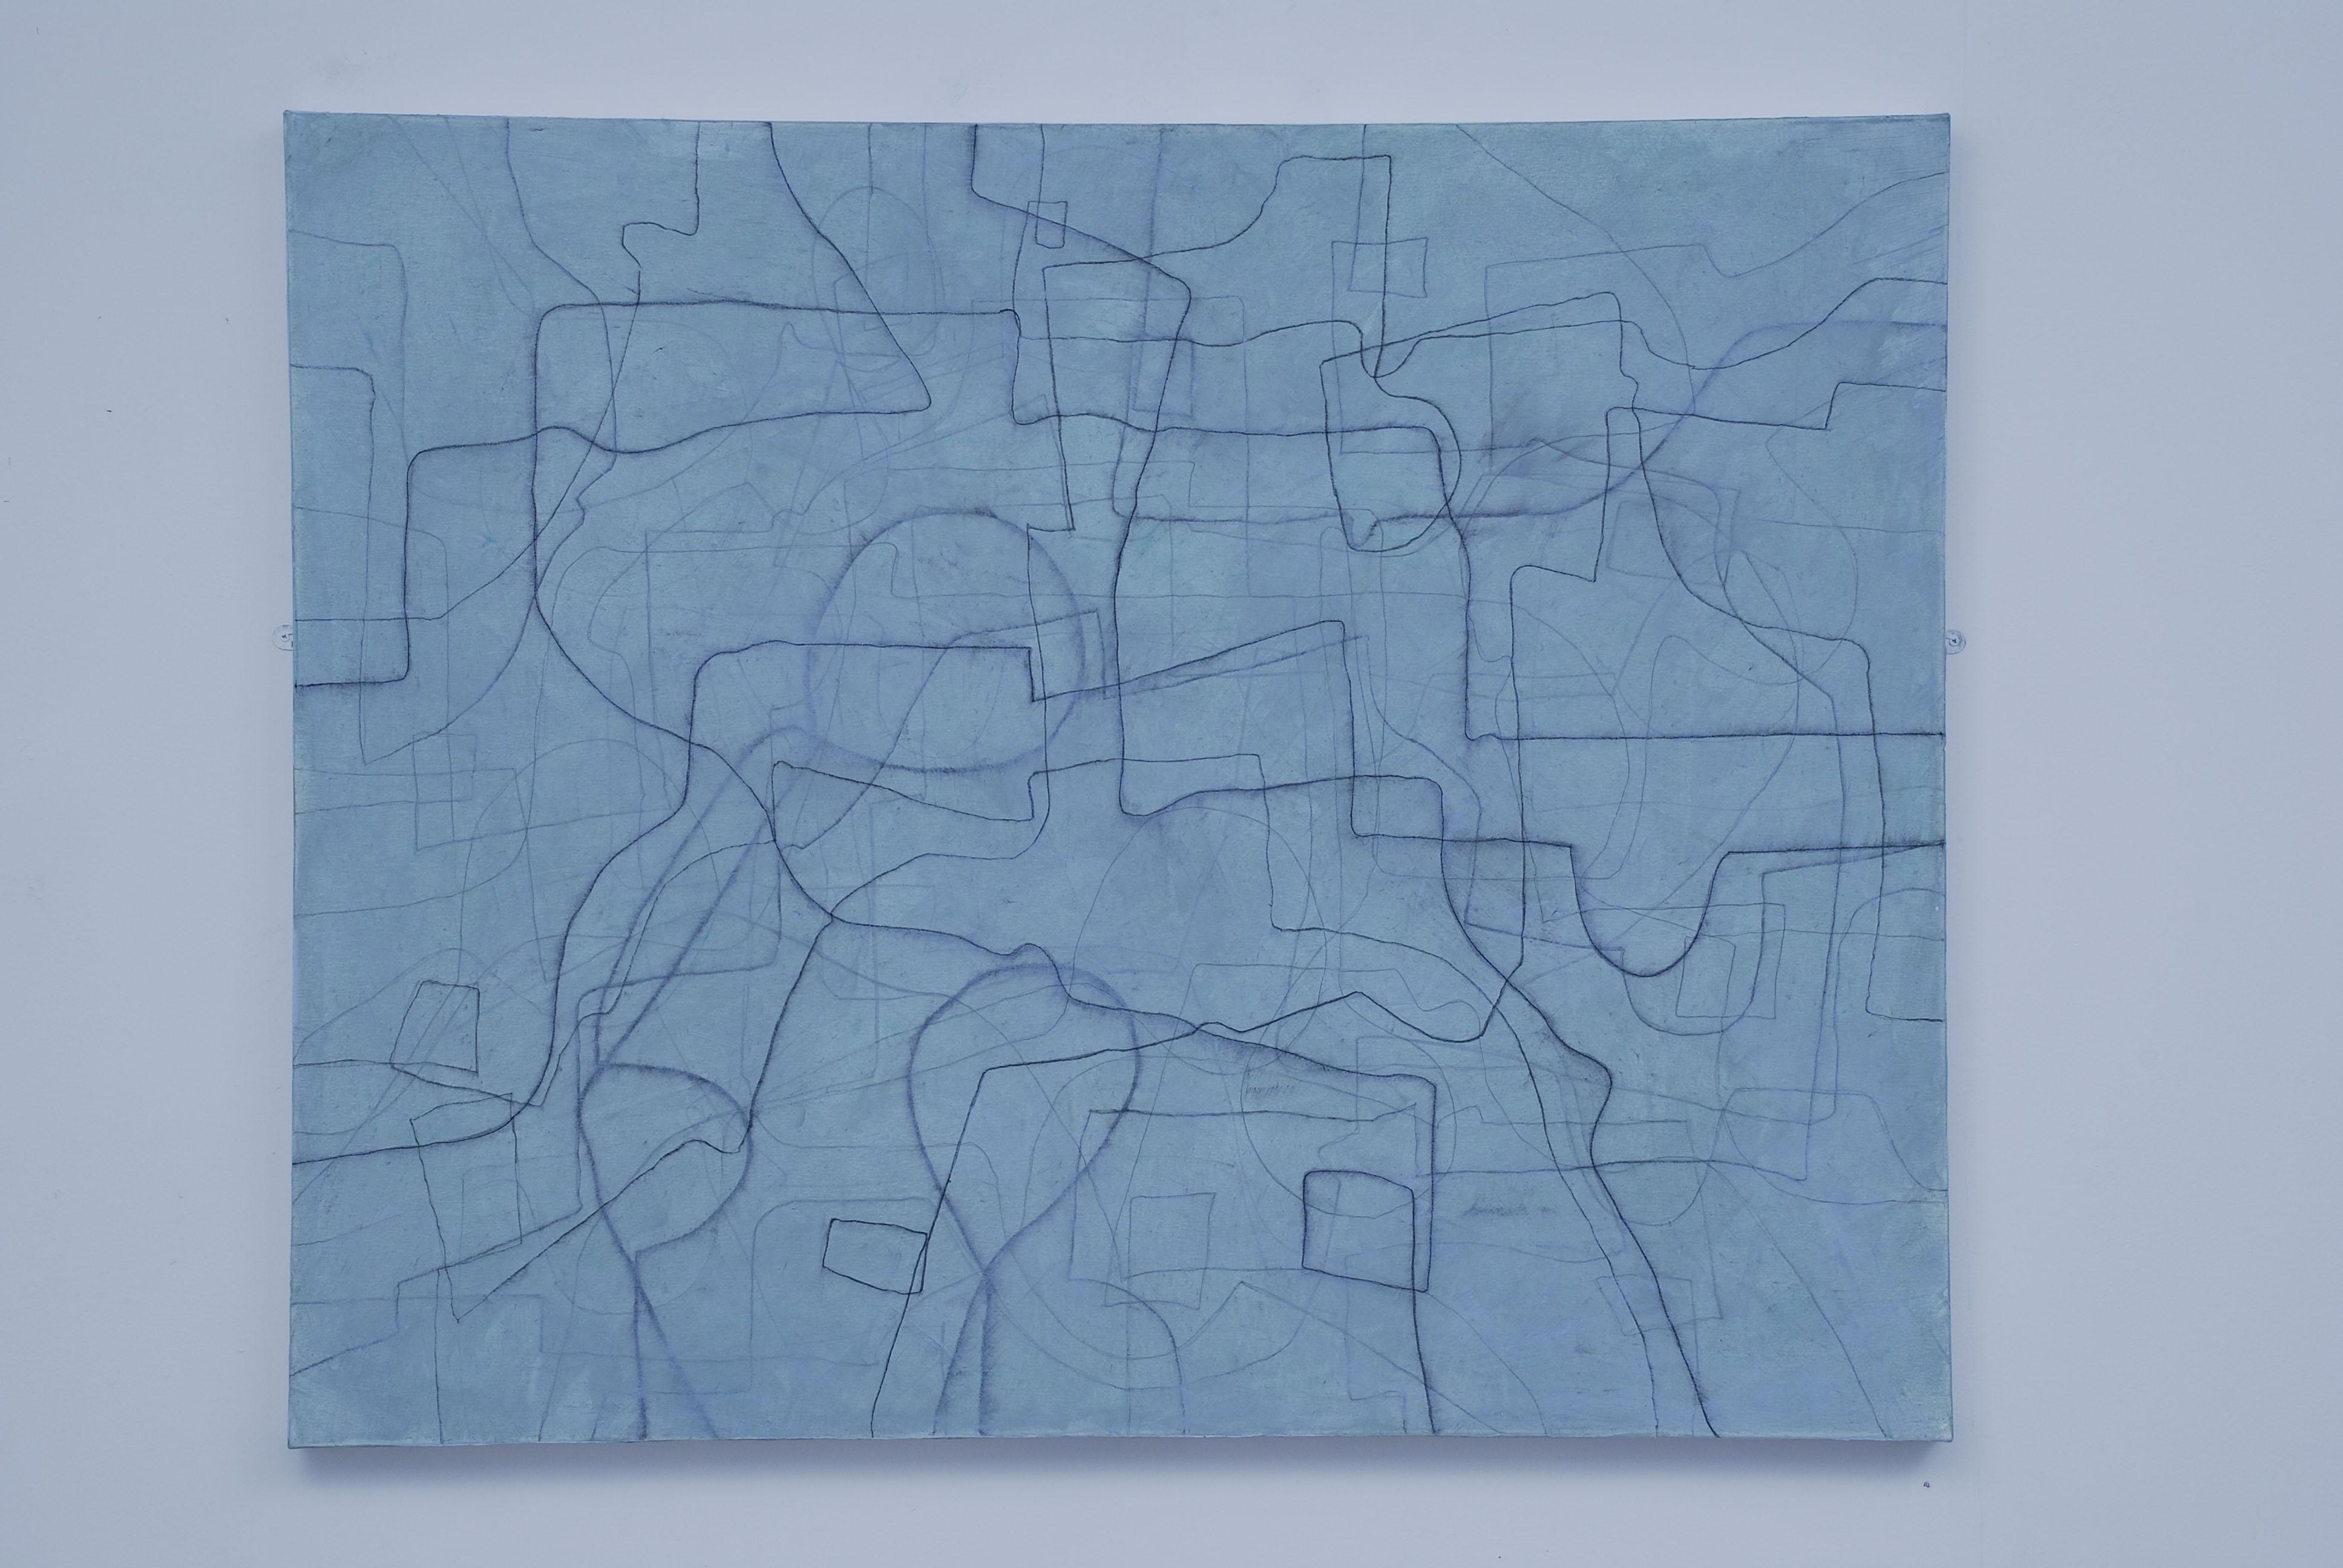 The Circular Walk. Acrylic and charcoal on canvas, 102 x 127 cms. 2007.